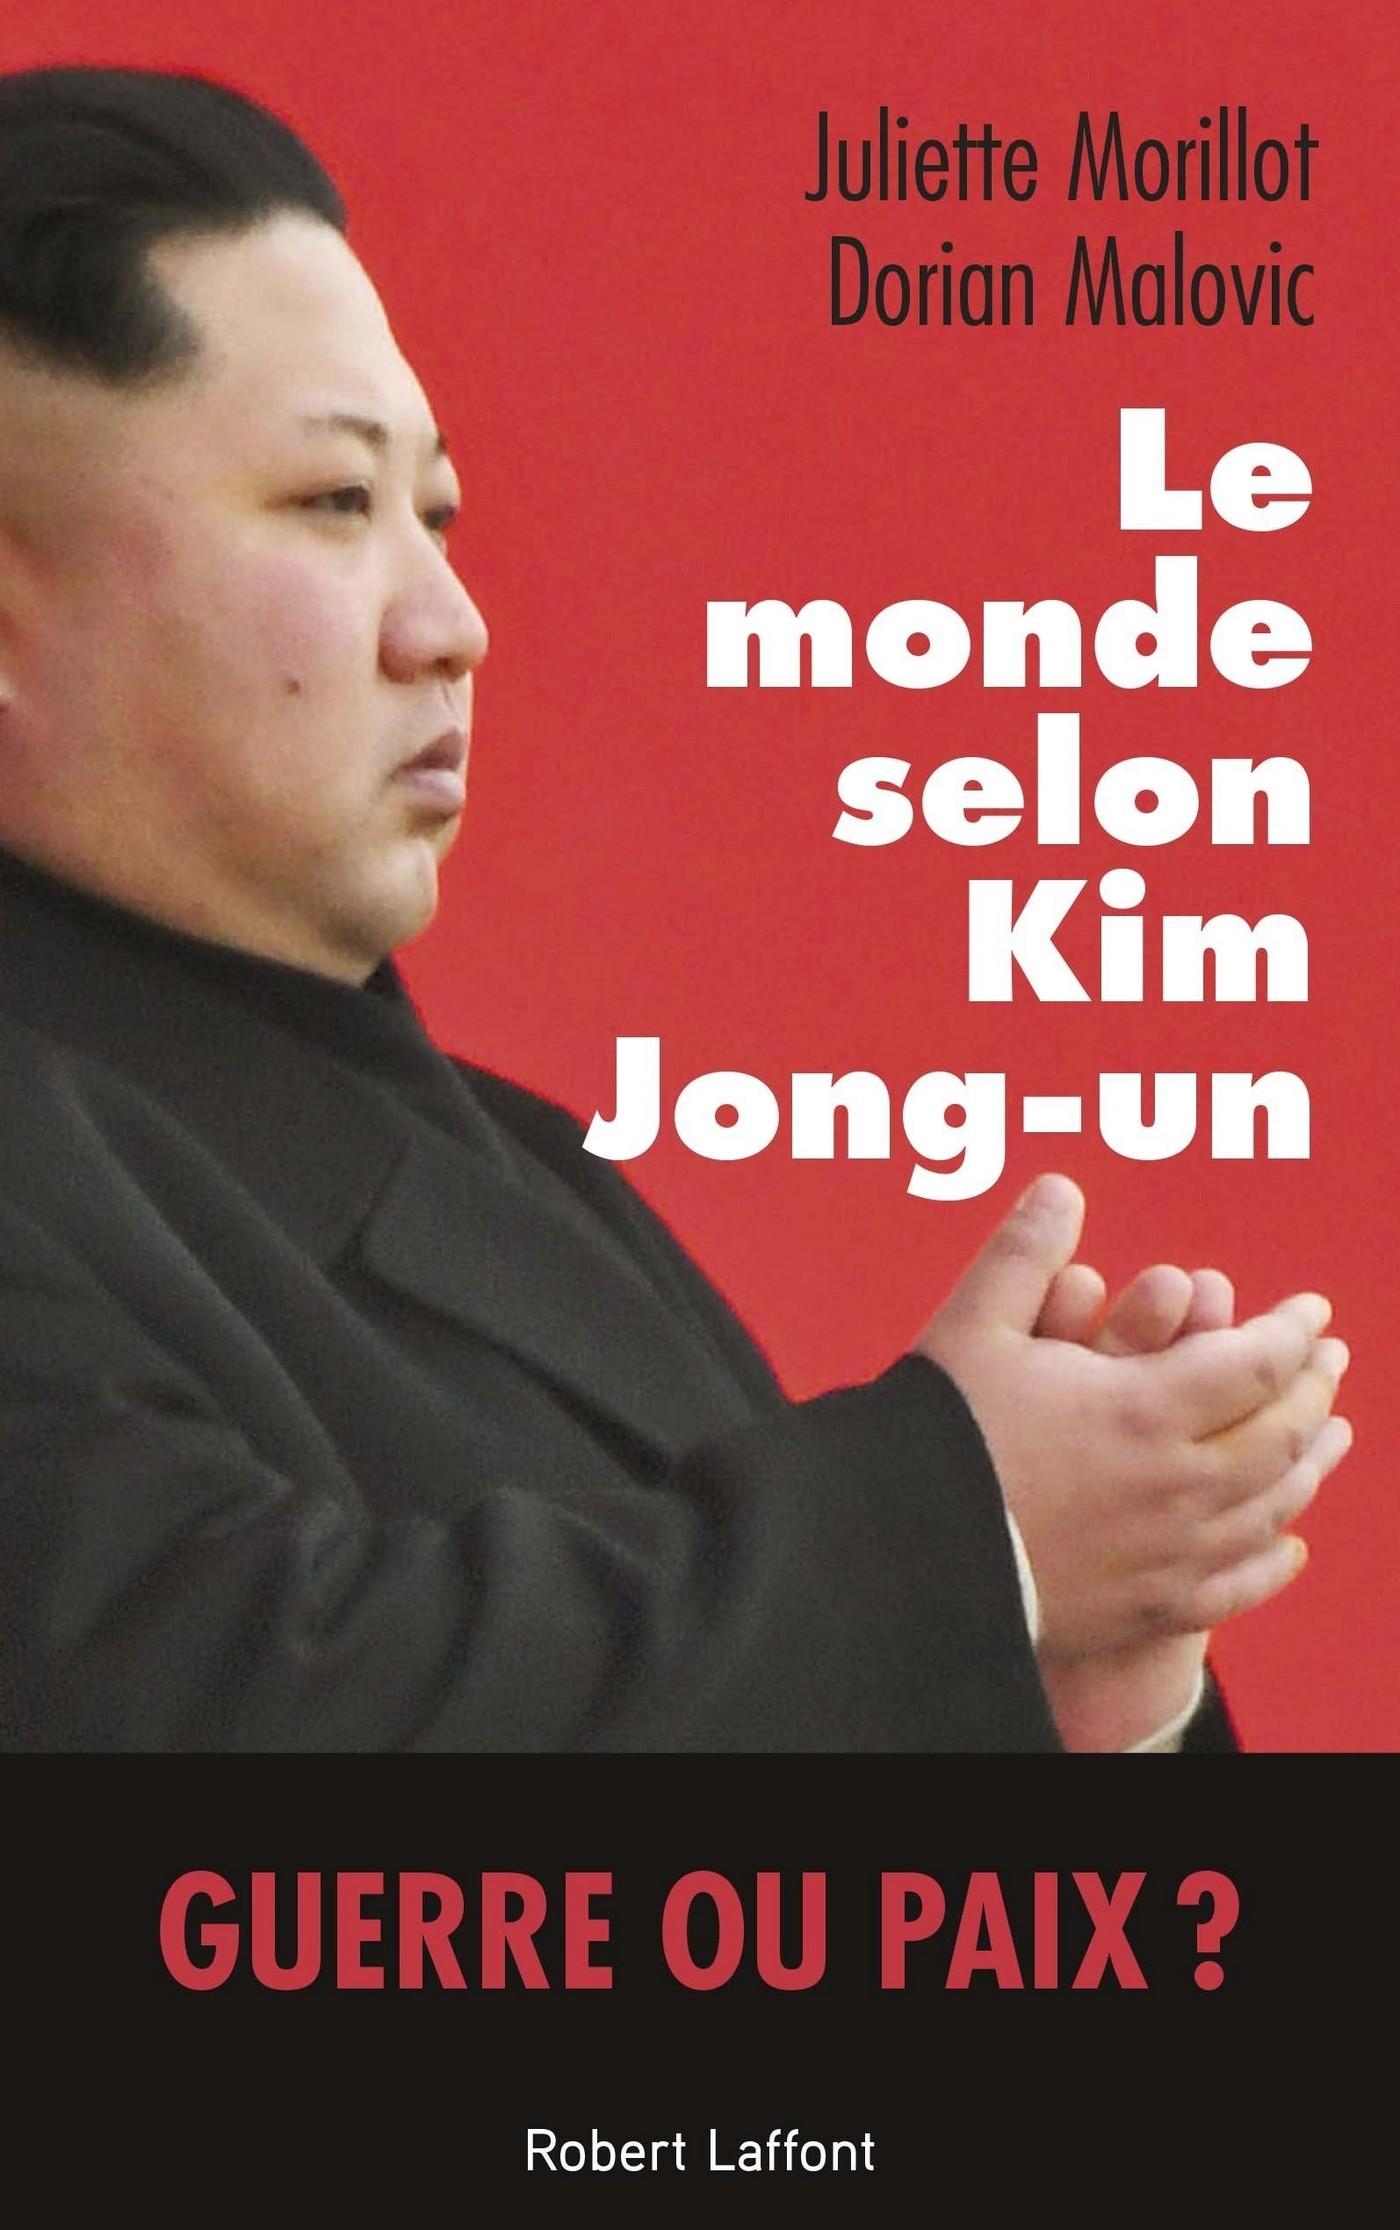 Le Monde selon Kim Jong-un | MALOVIC, Dorian